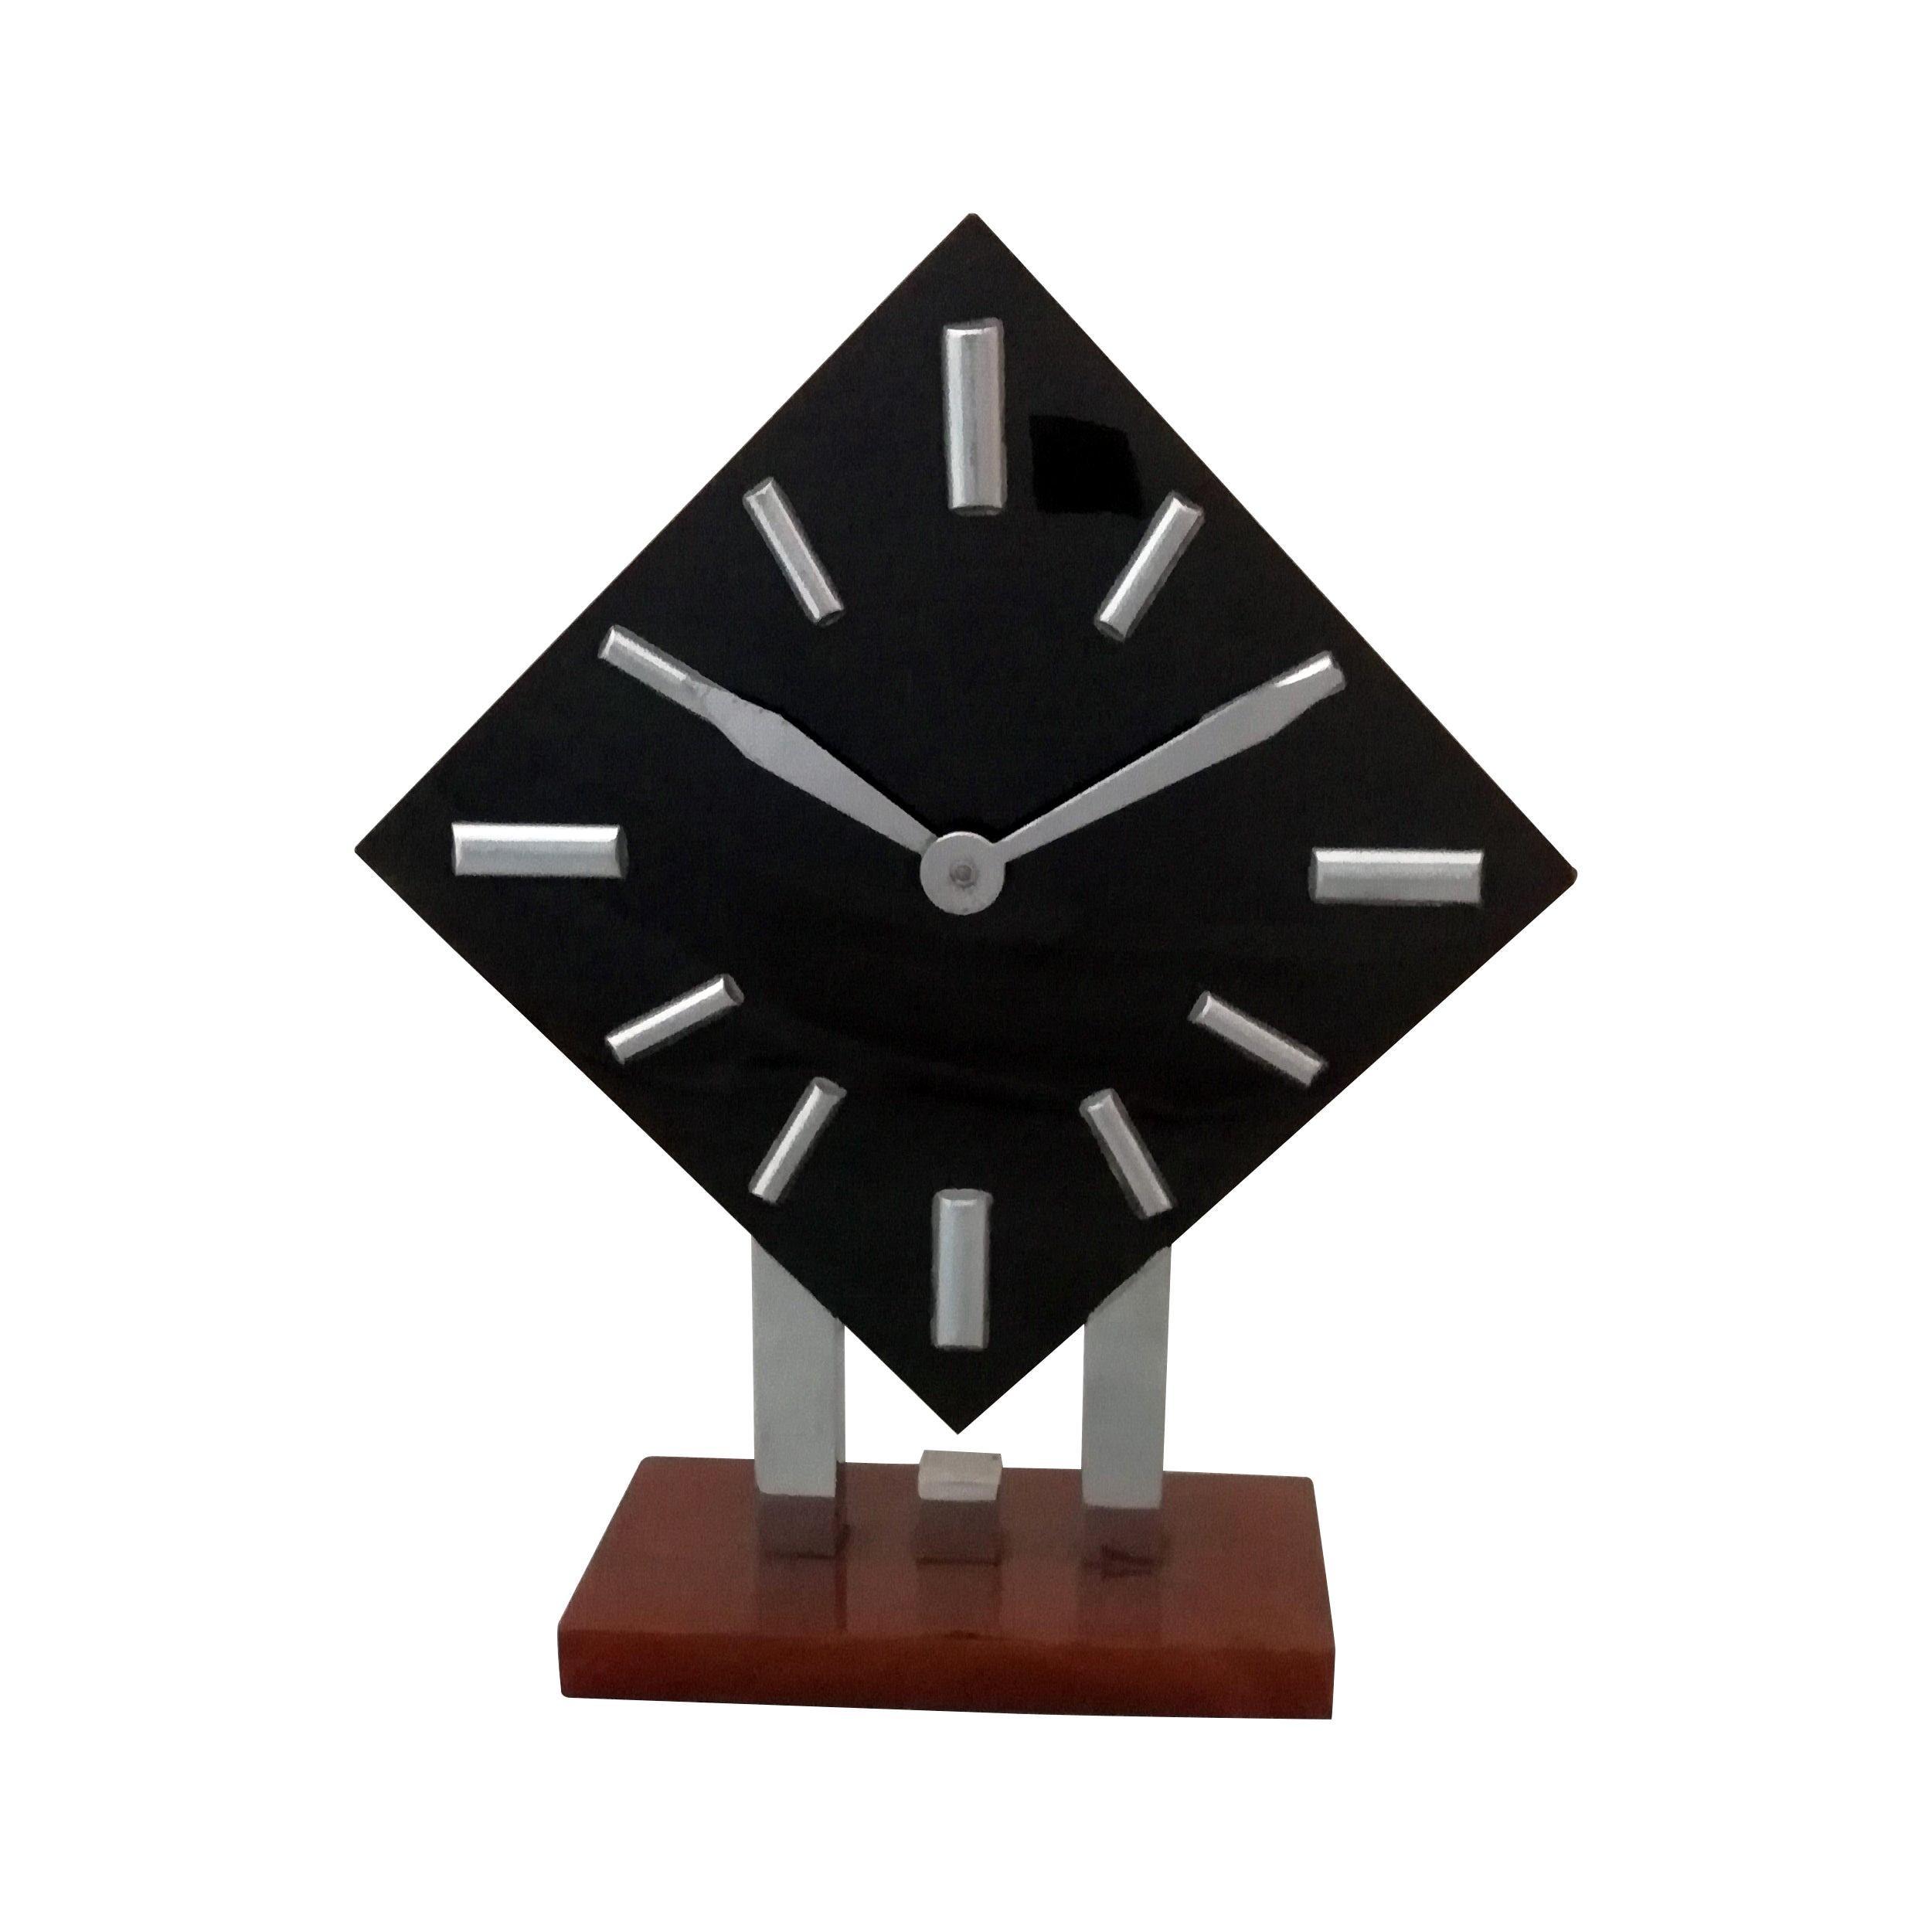 Art Deco Bakelite and Chrome Wind-Up Alarm Clock